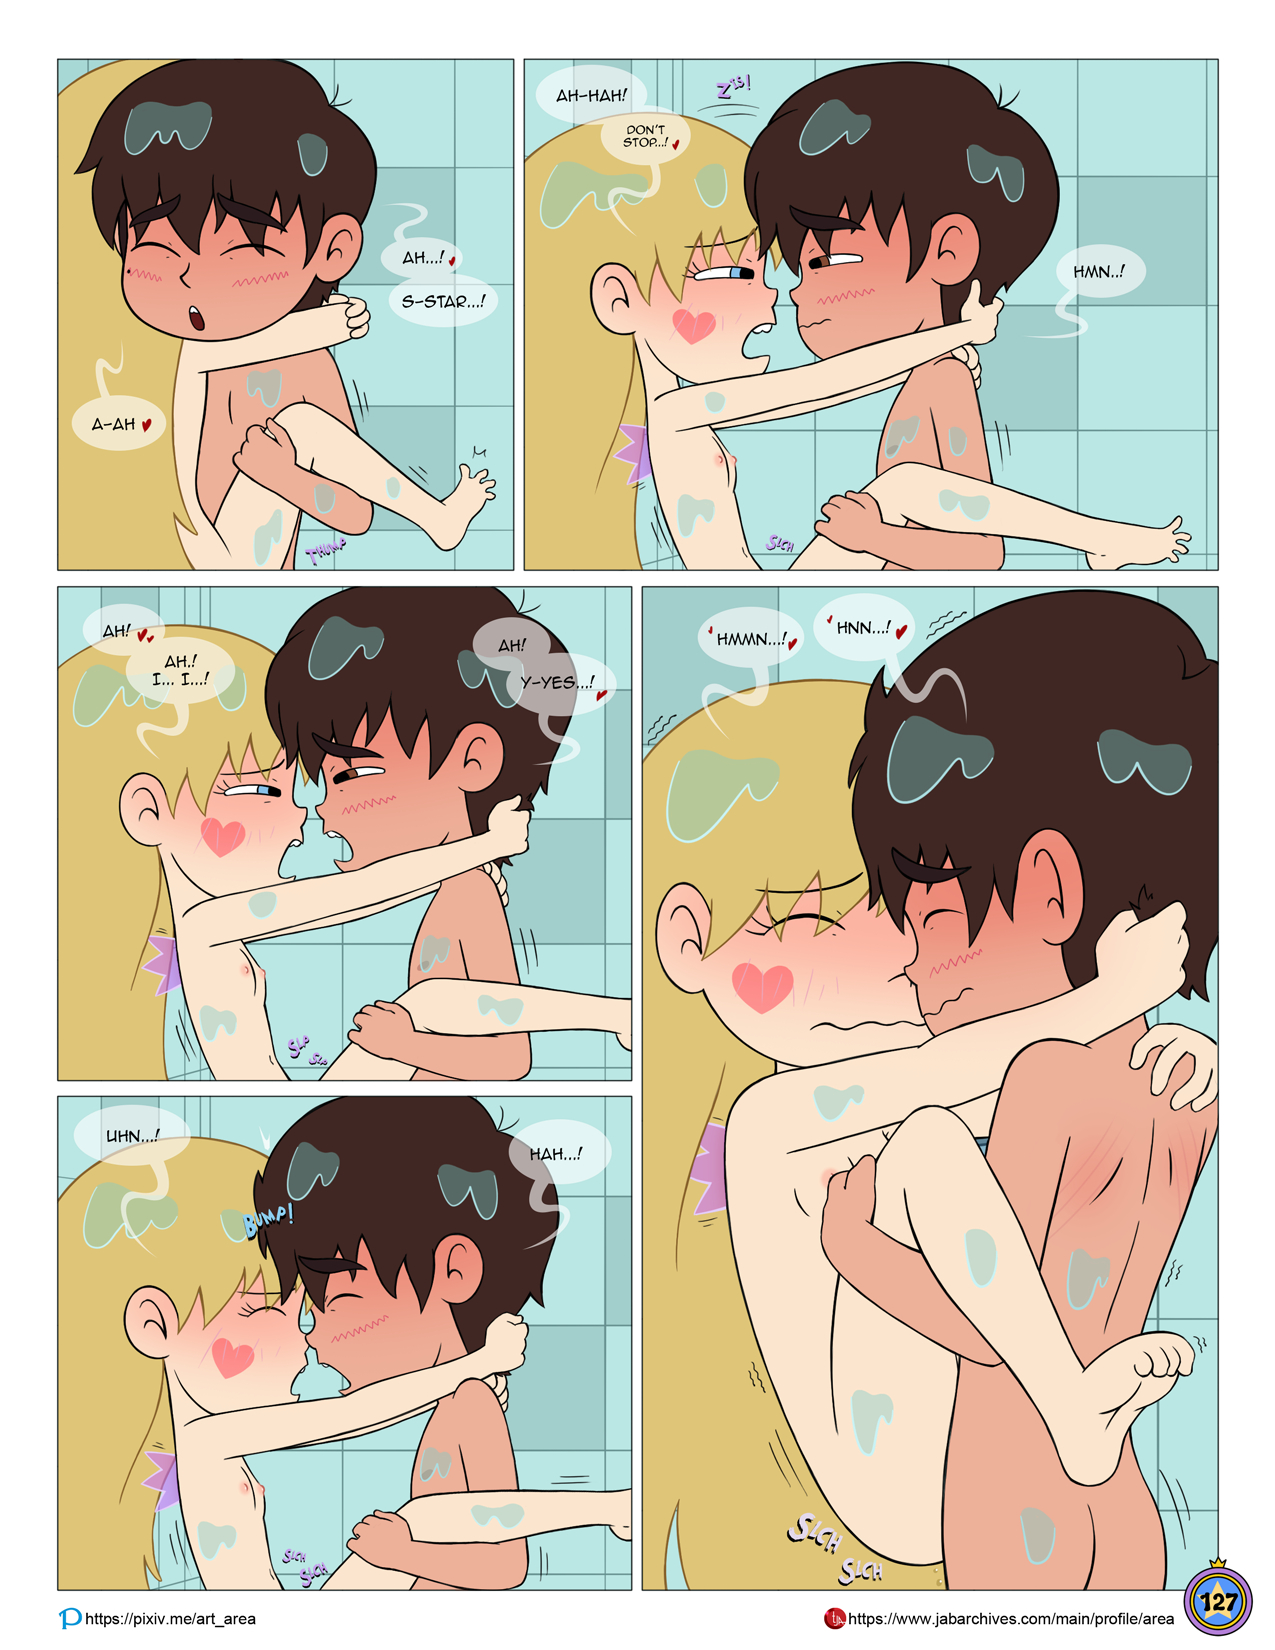 Between friends porn comic picture 128